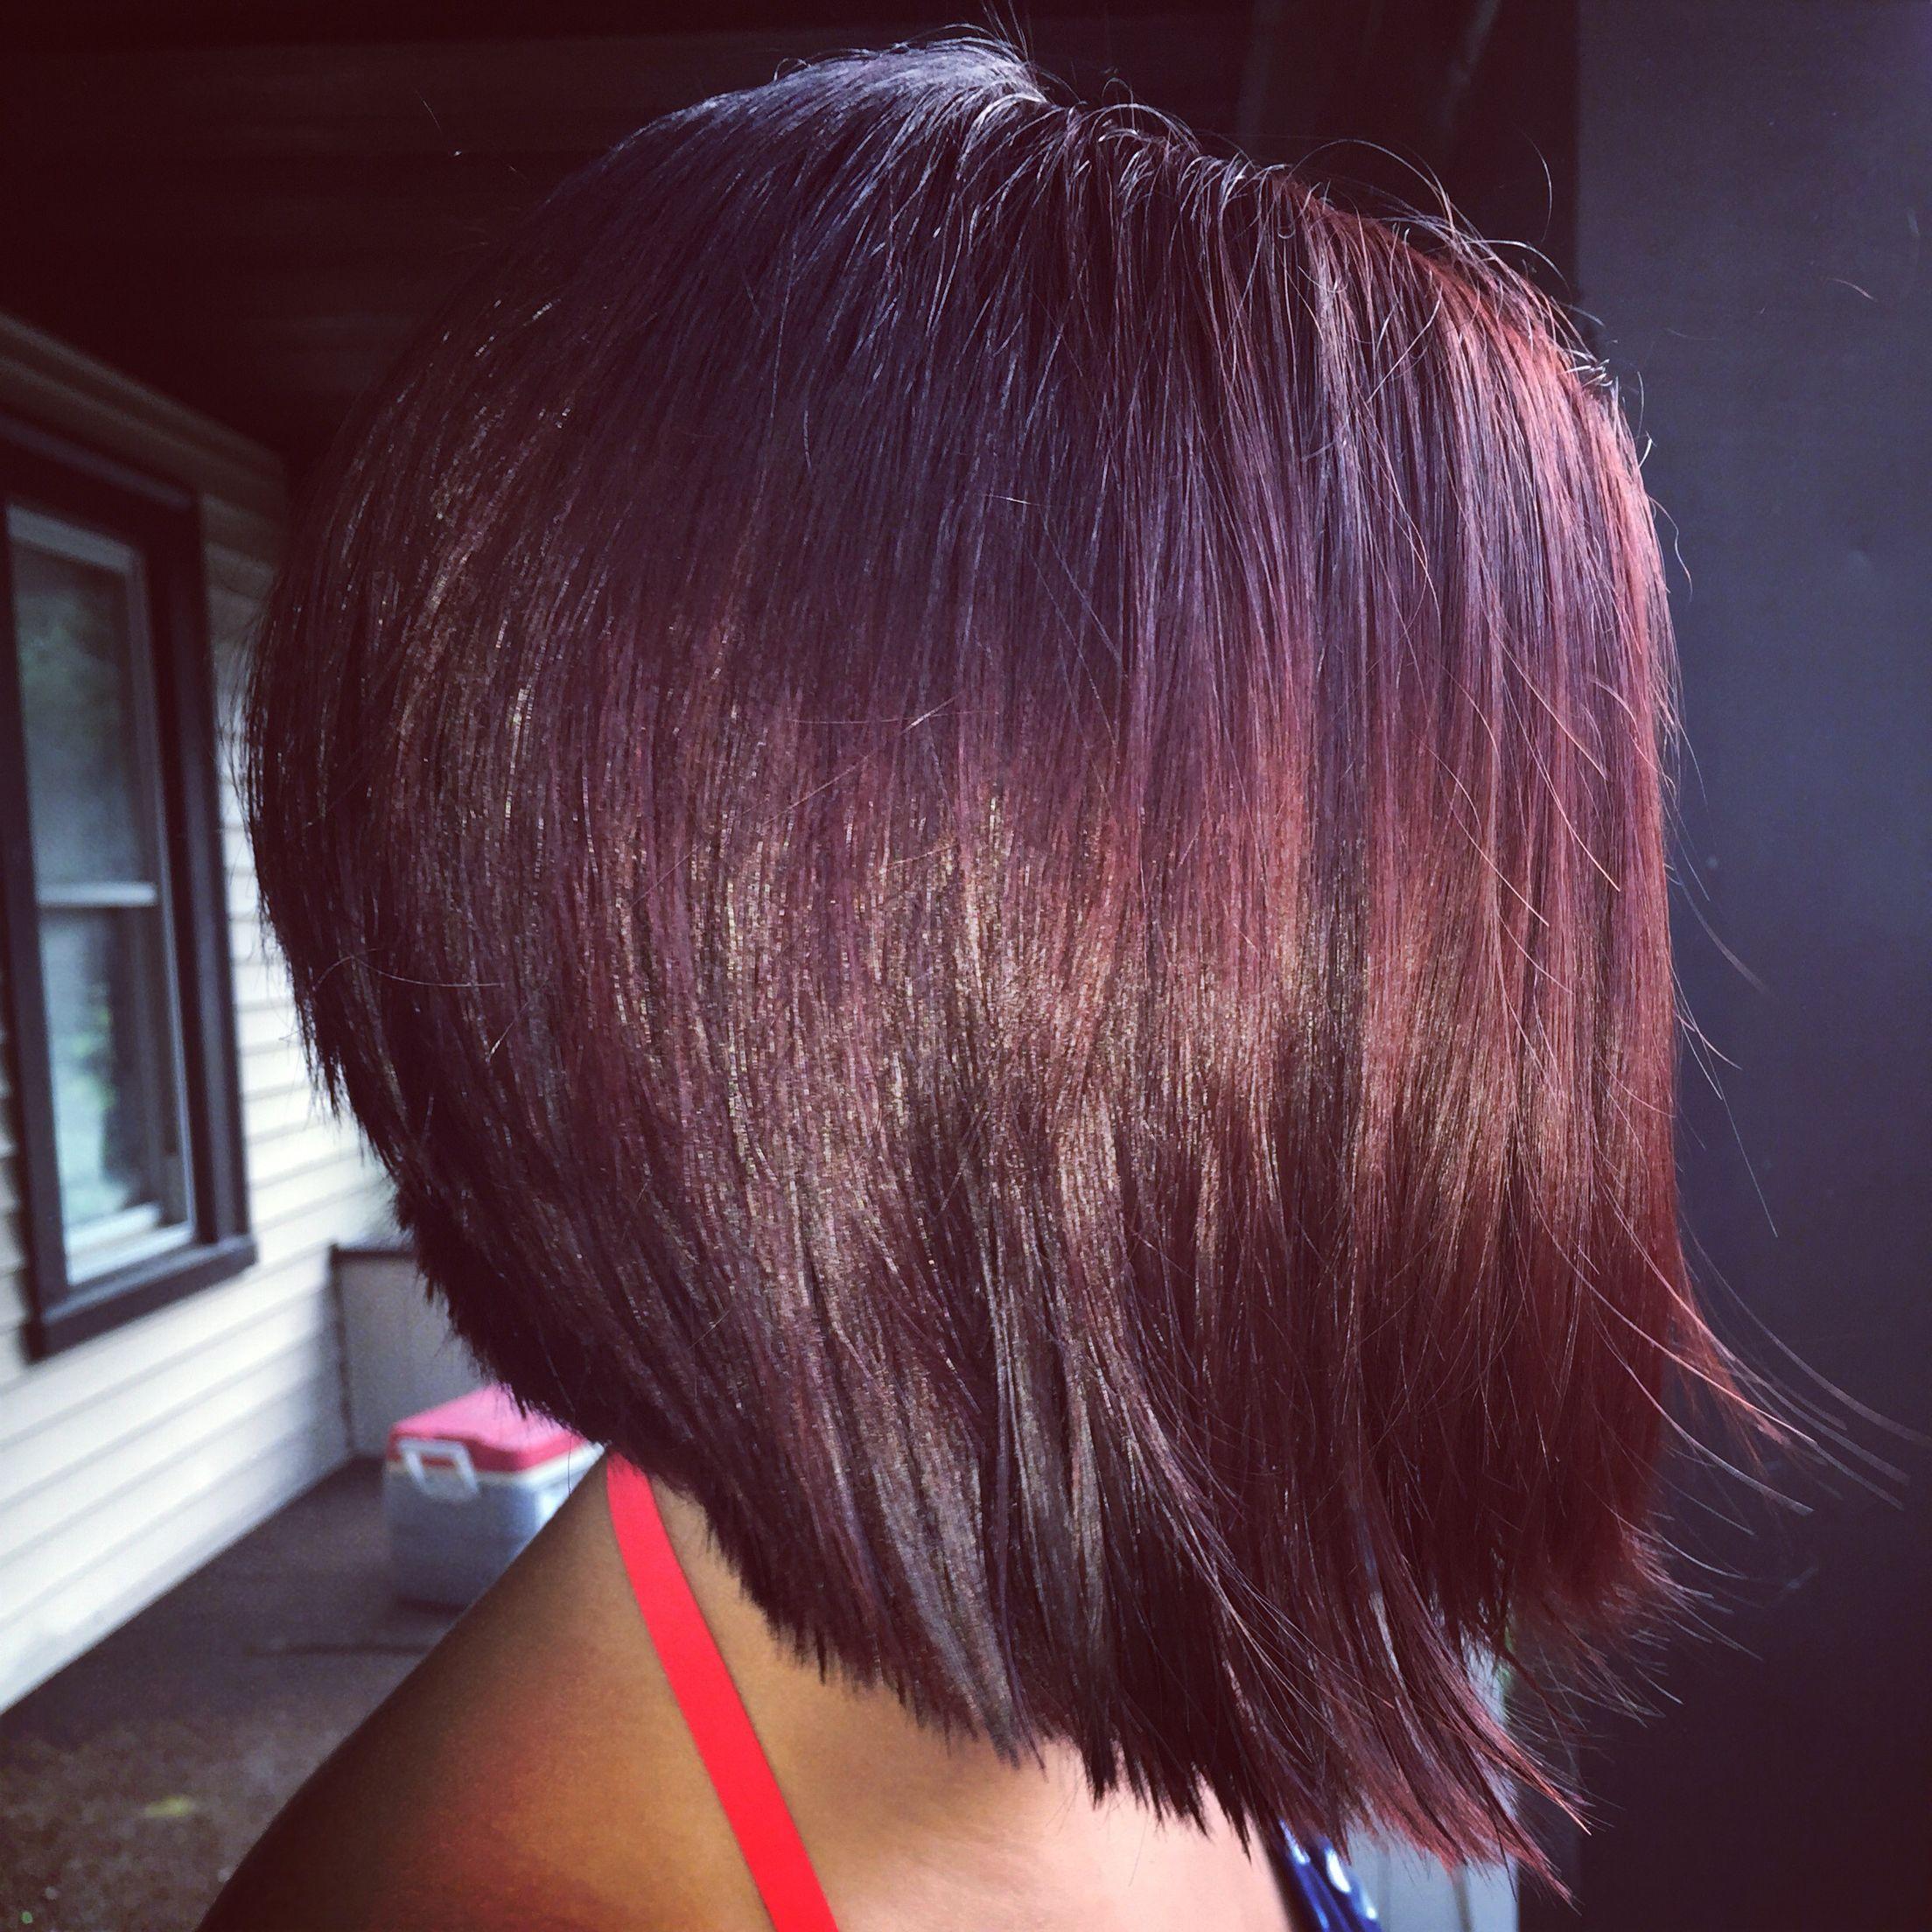 Pm shines 3rv my hair journey pinterest paul mitchell color pm shines 3rv nvjuhfo Choice Image